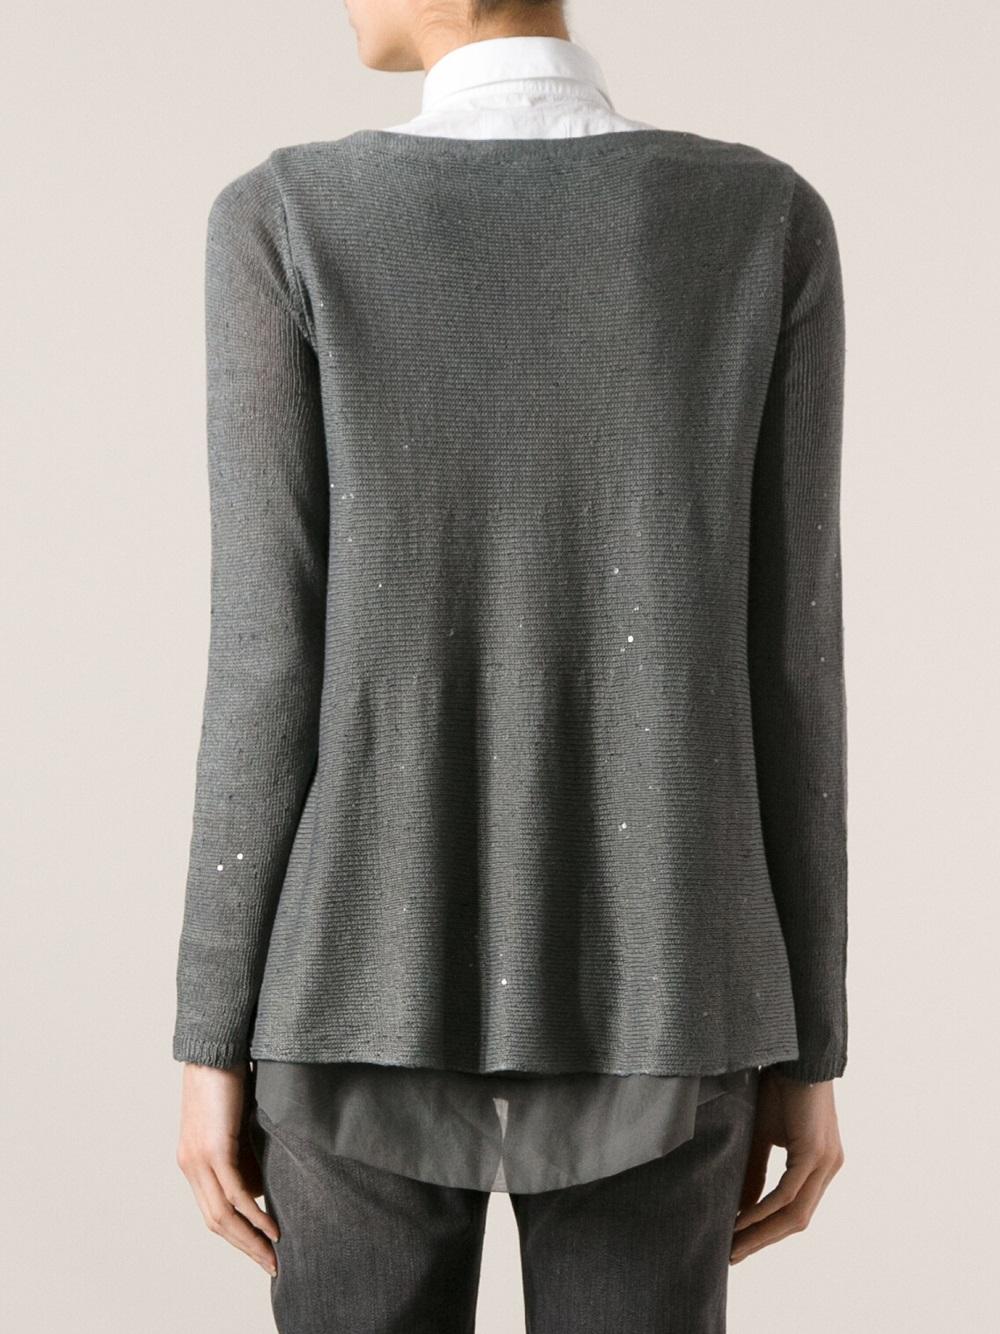 Brunello cucinelli Sheer Knit Sweater in Gray   Lyst